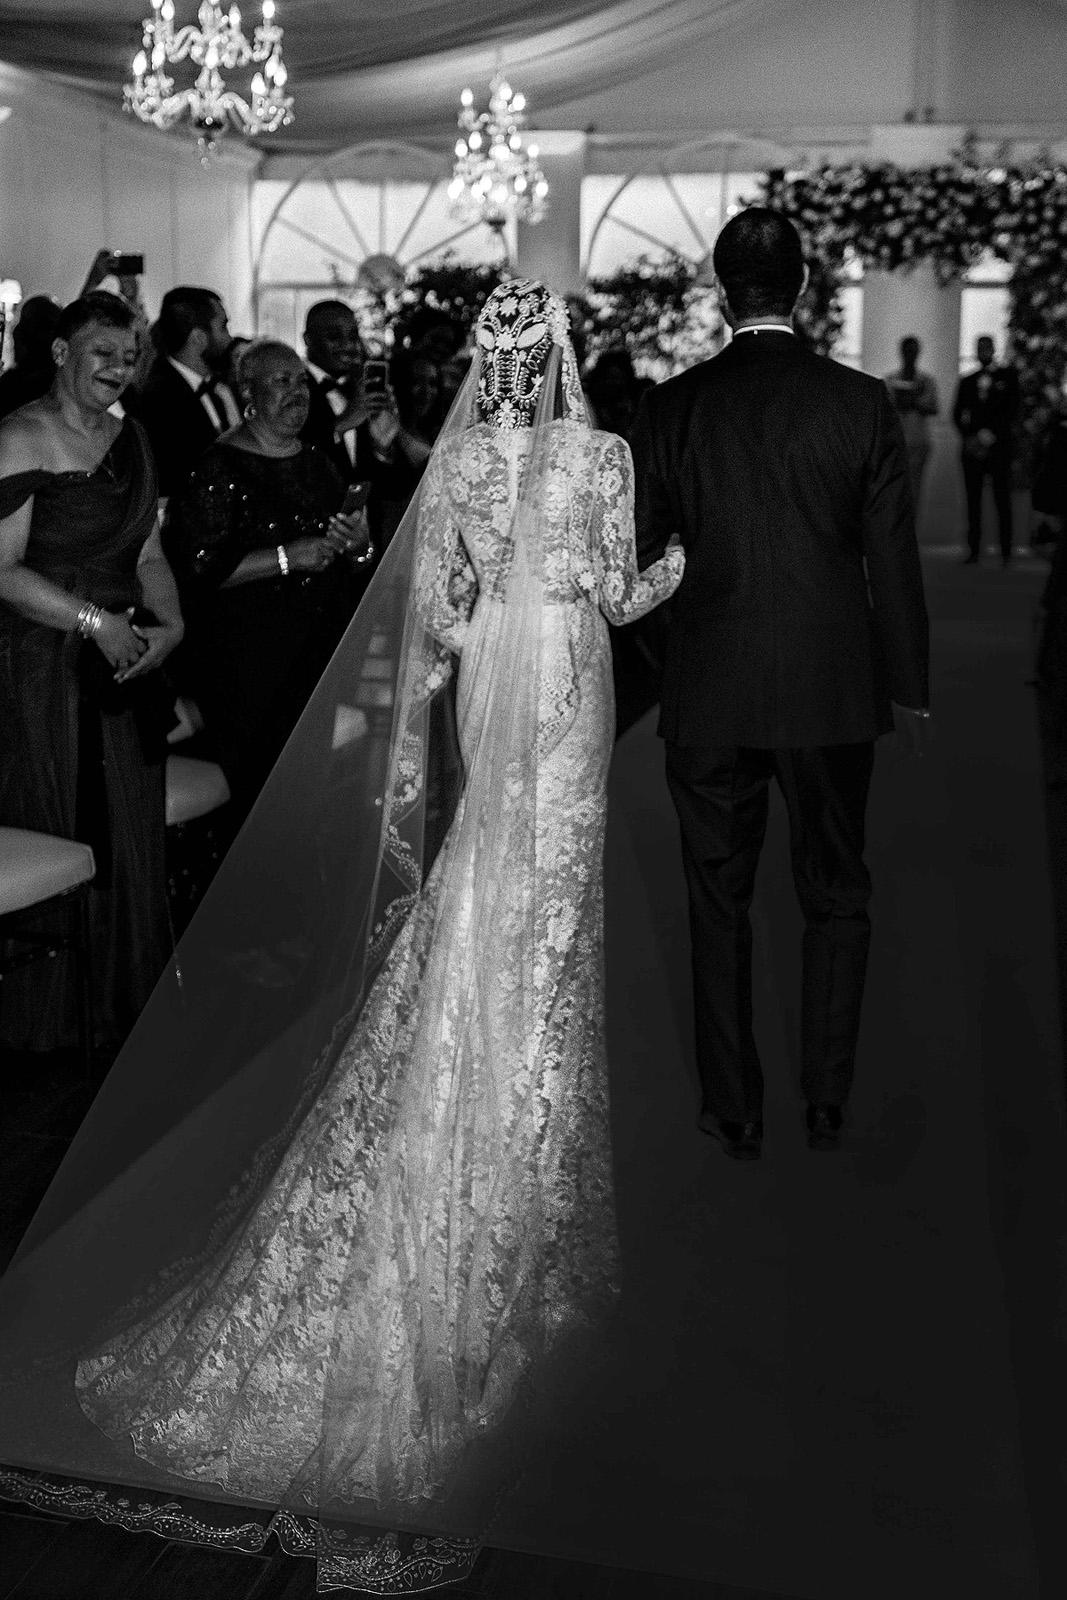 bride walking down aisle in long lace veil